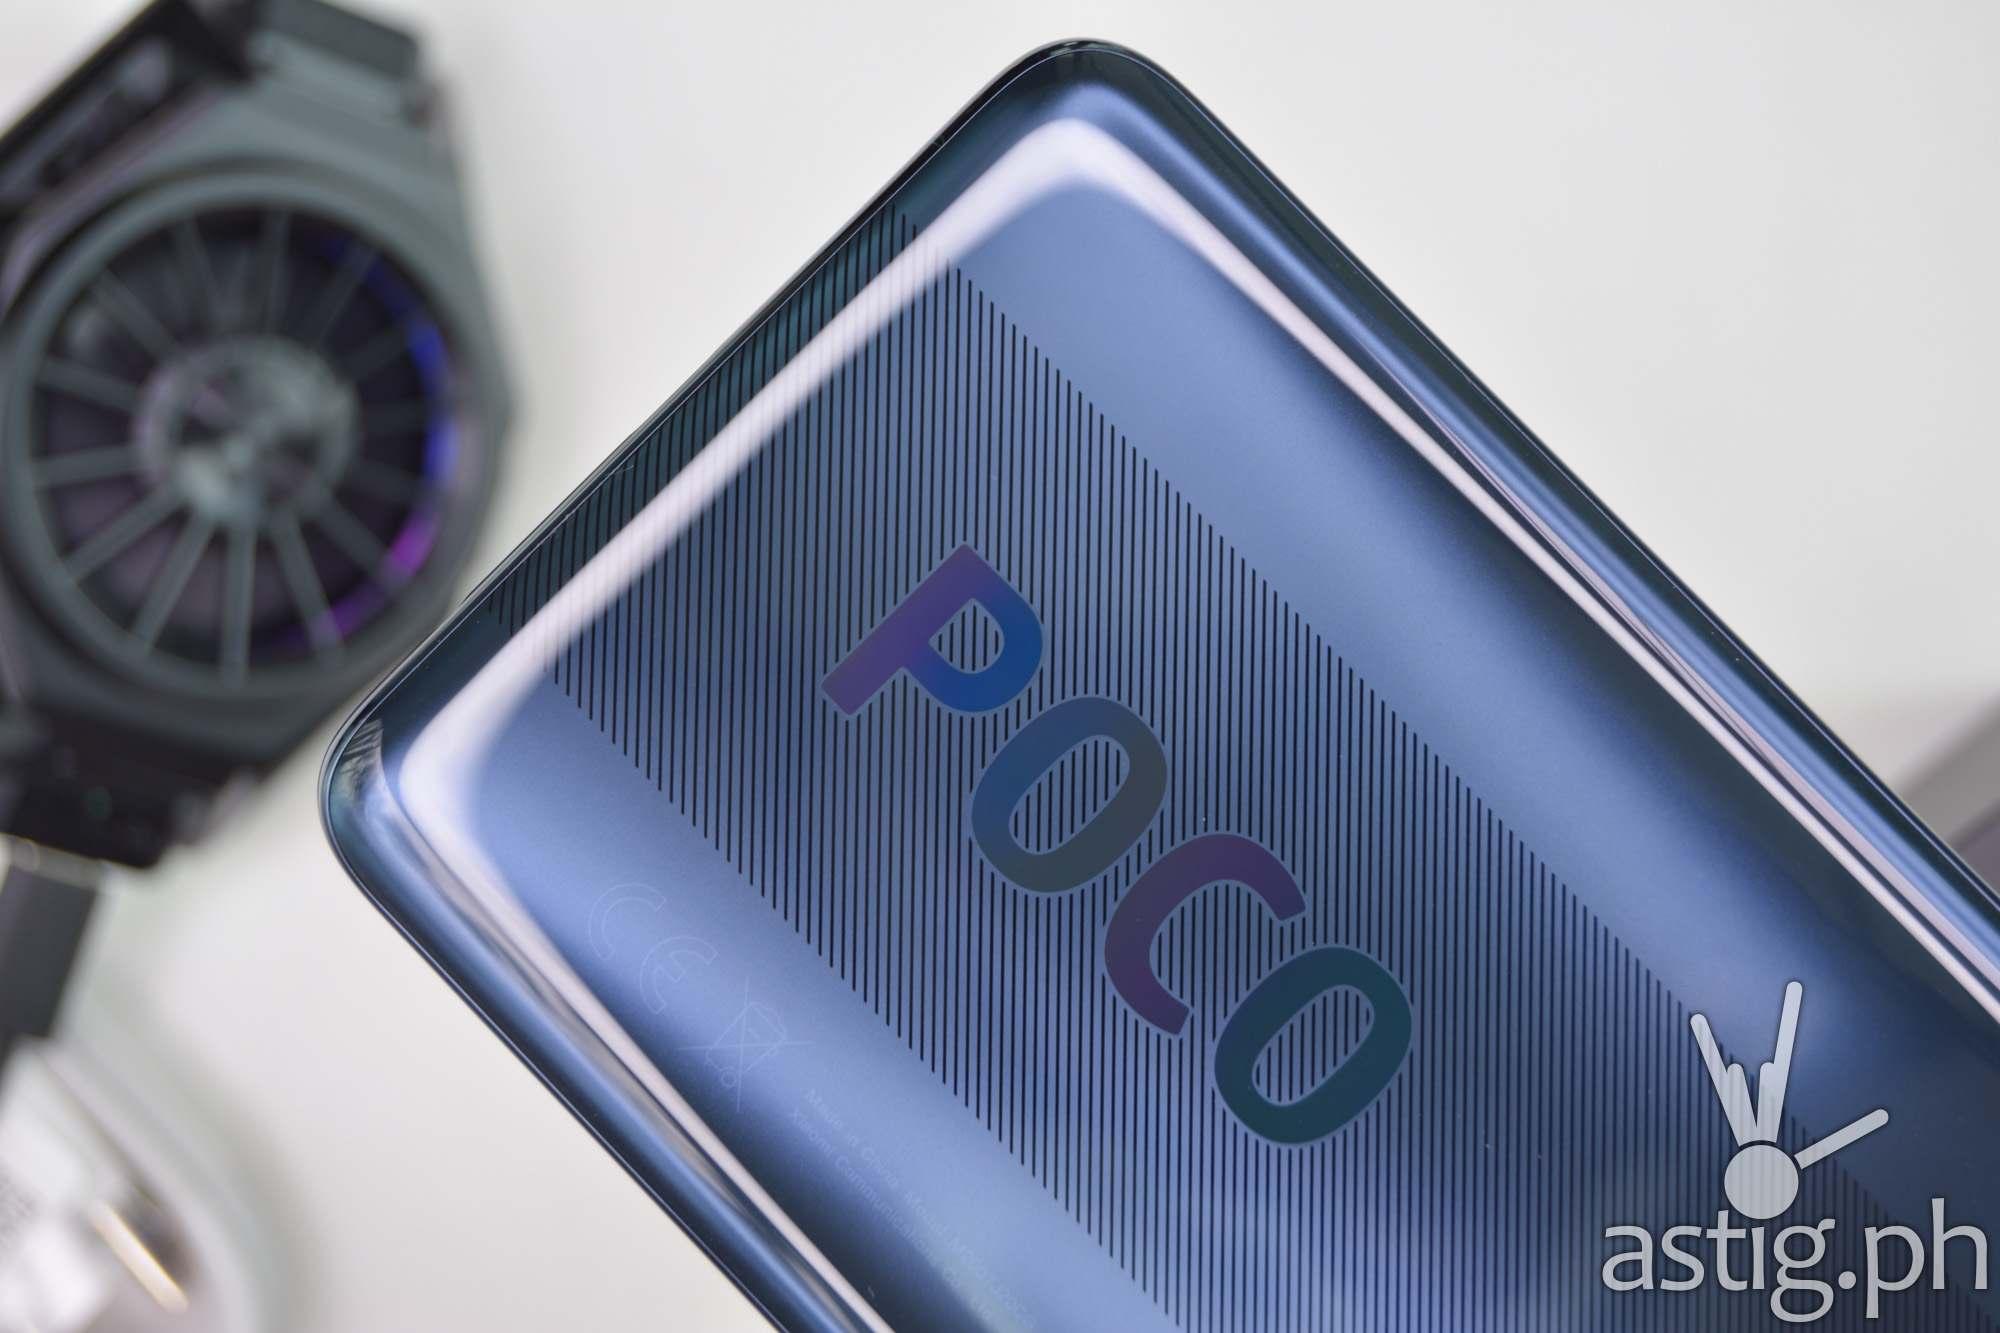 Back logo gray - 202009 POCO X3 NFC (Philippines)